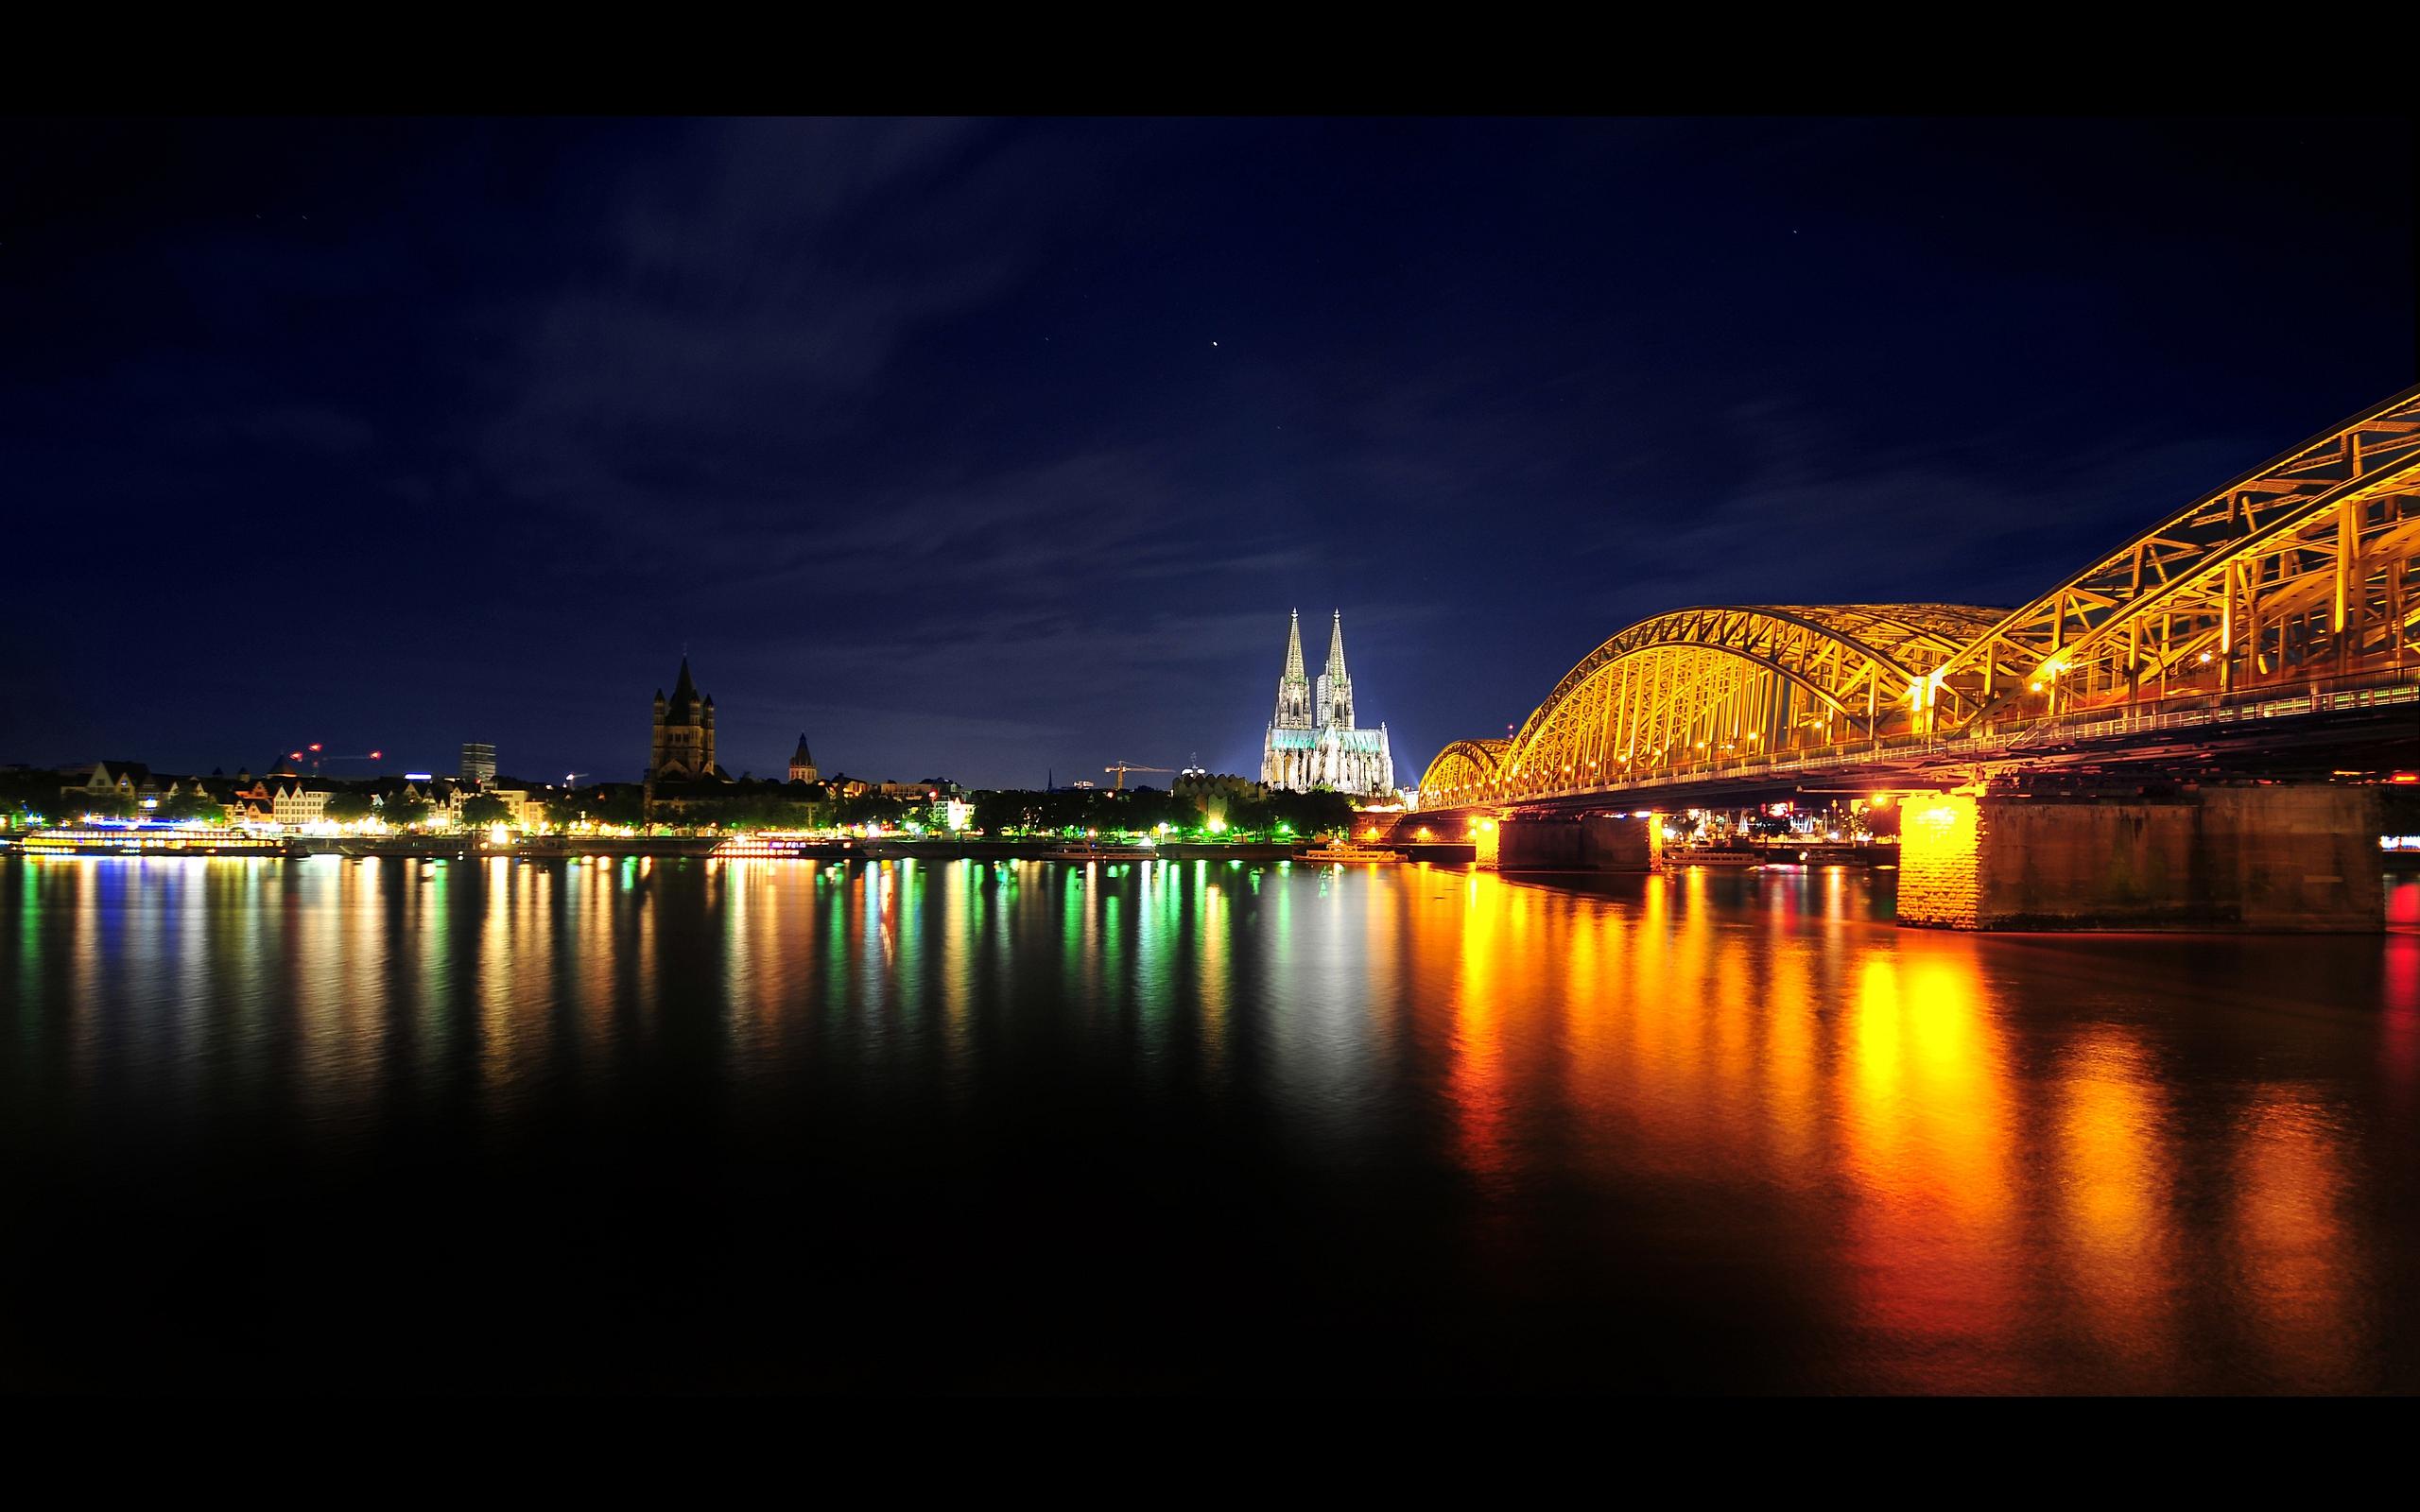 Colors of Rhine widescreen wallpaper Wide WallpapersNET 2560x1600